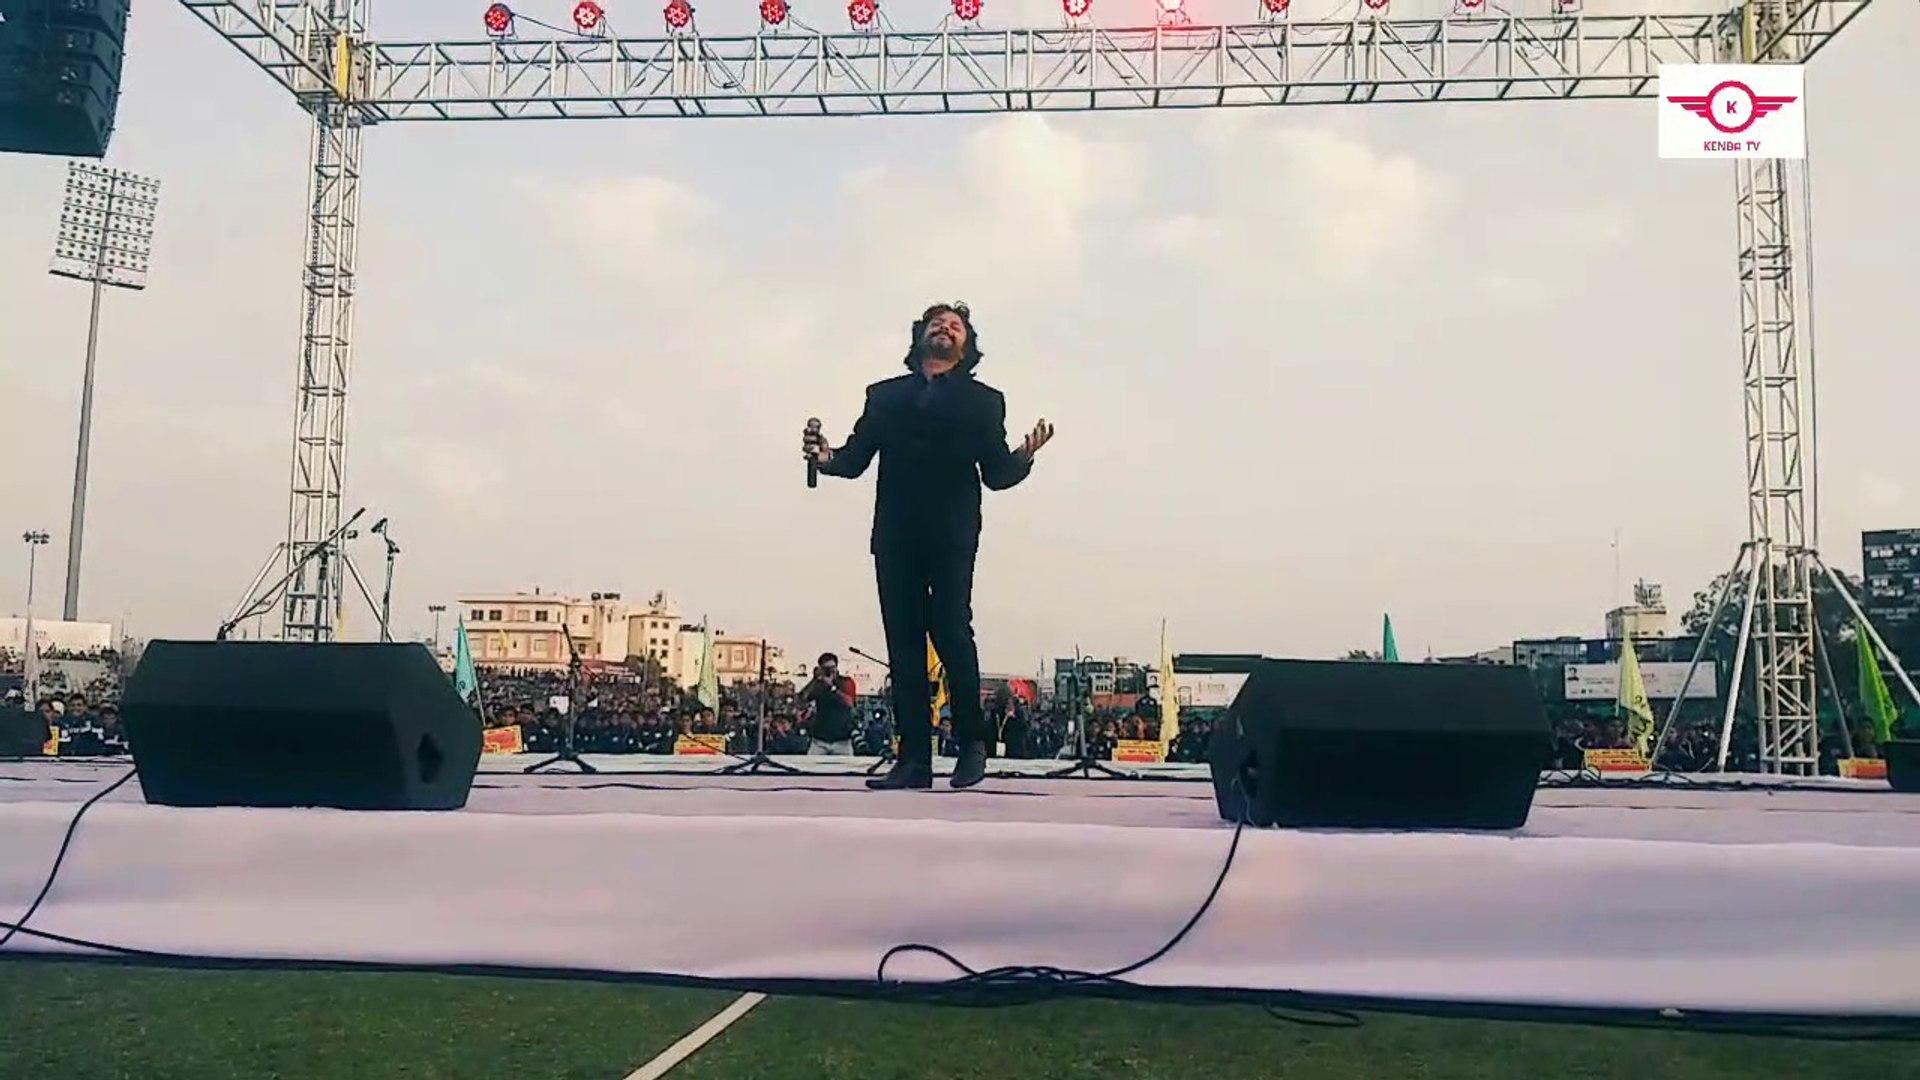 State Games 2020 | Ravindra Upadhayay | रंगारंग उद्घाटन समारोह में रविन्द्र उपाध्याय | Ravindra Upad